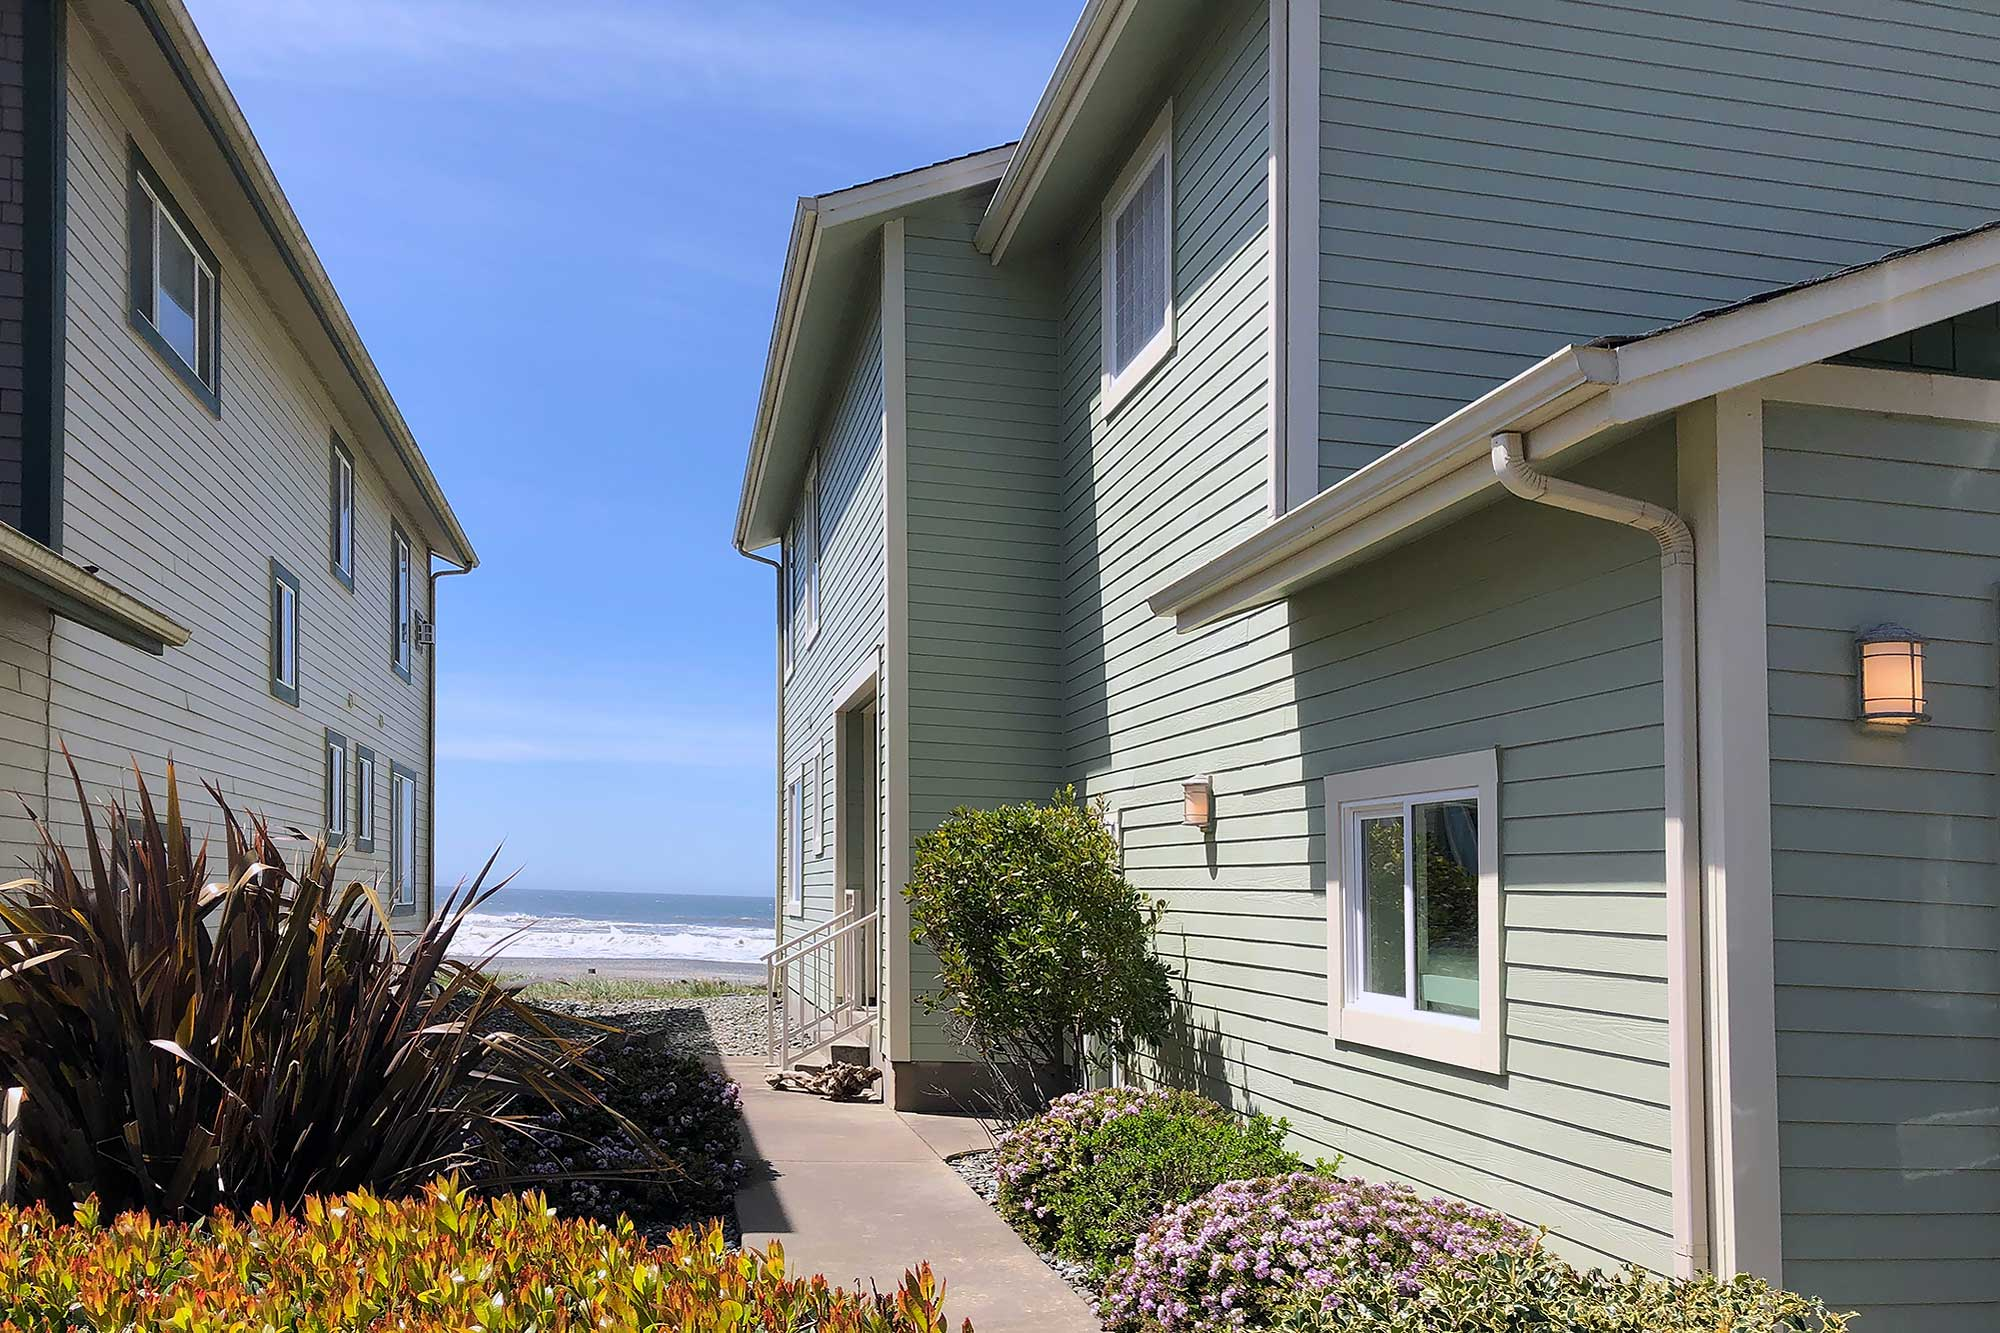 Sea & Sky - Gold Beach Vacation Rental Home